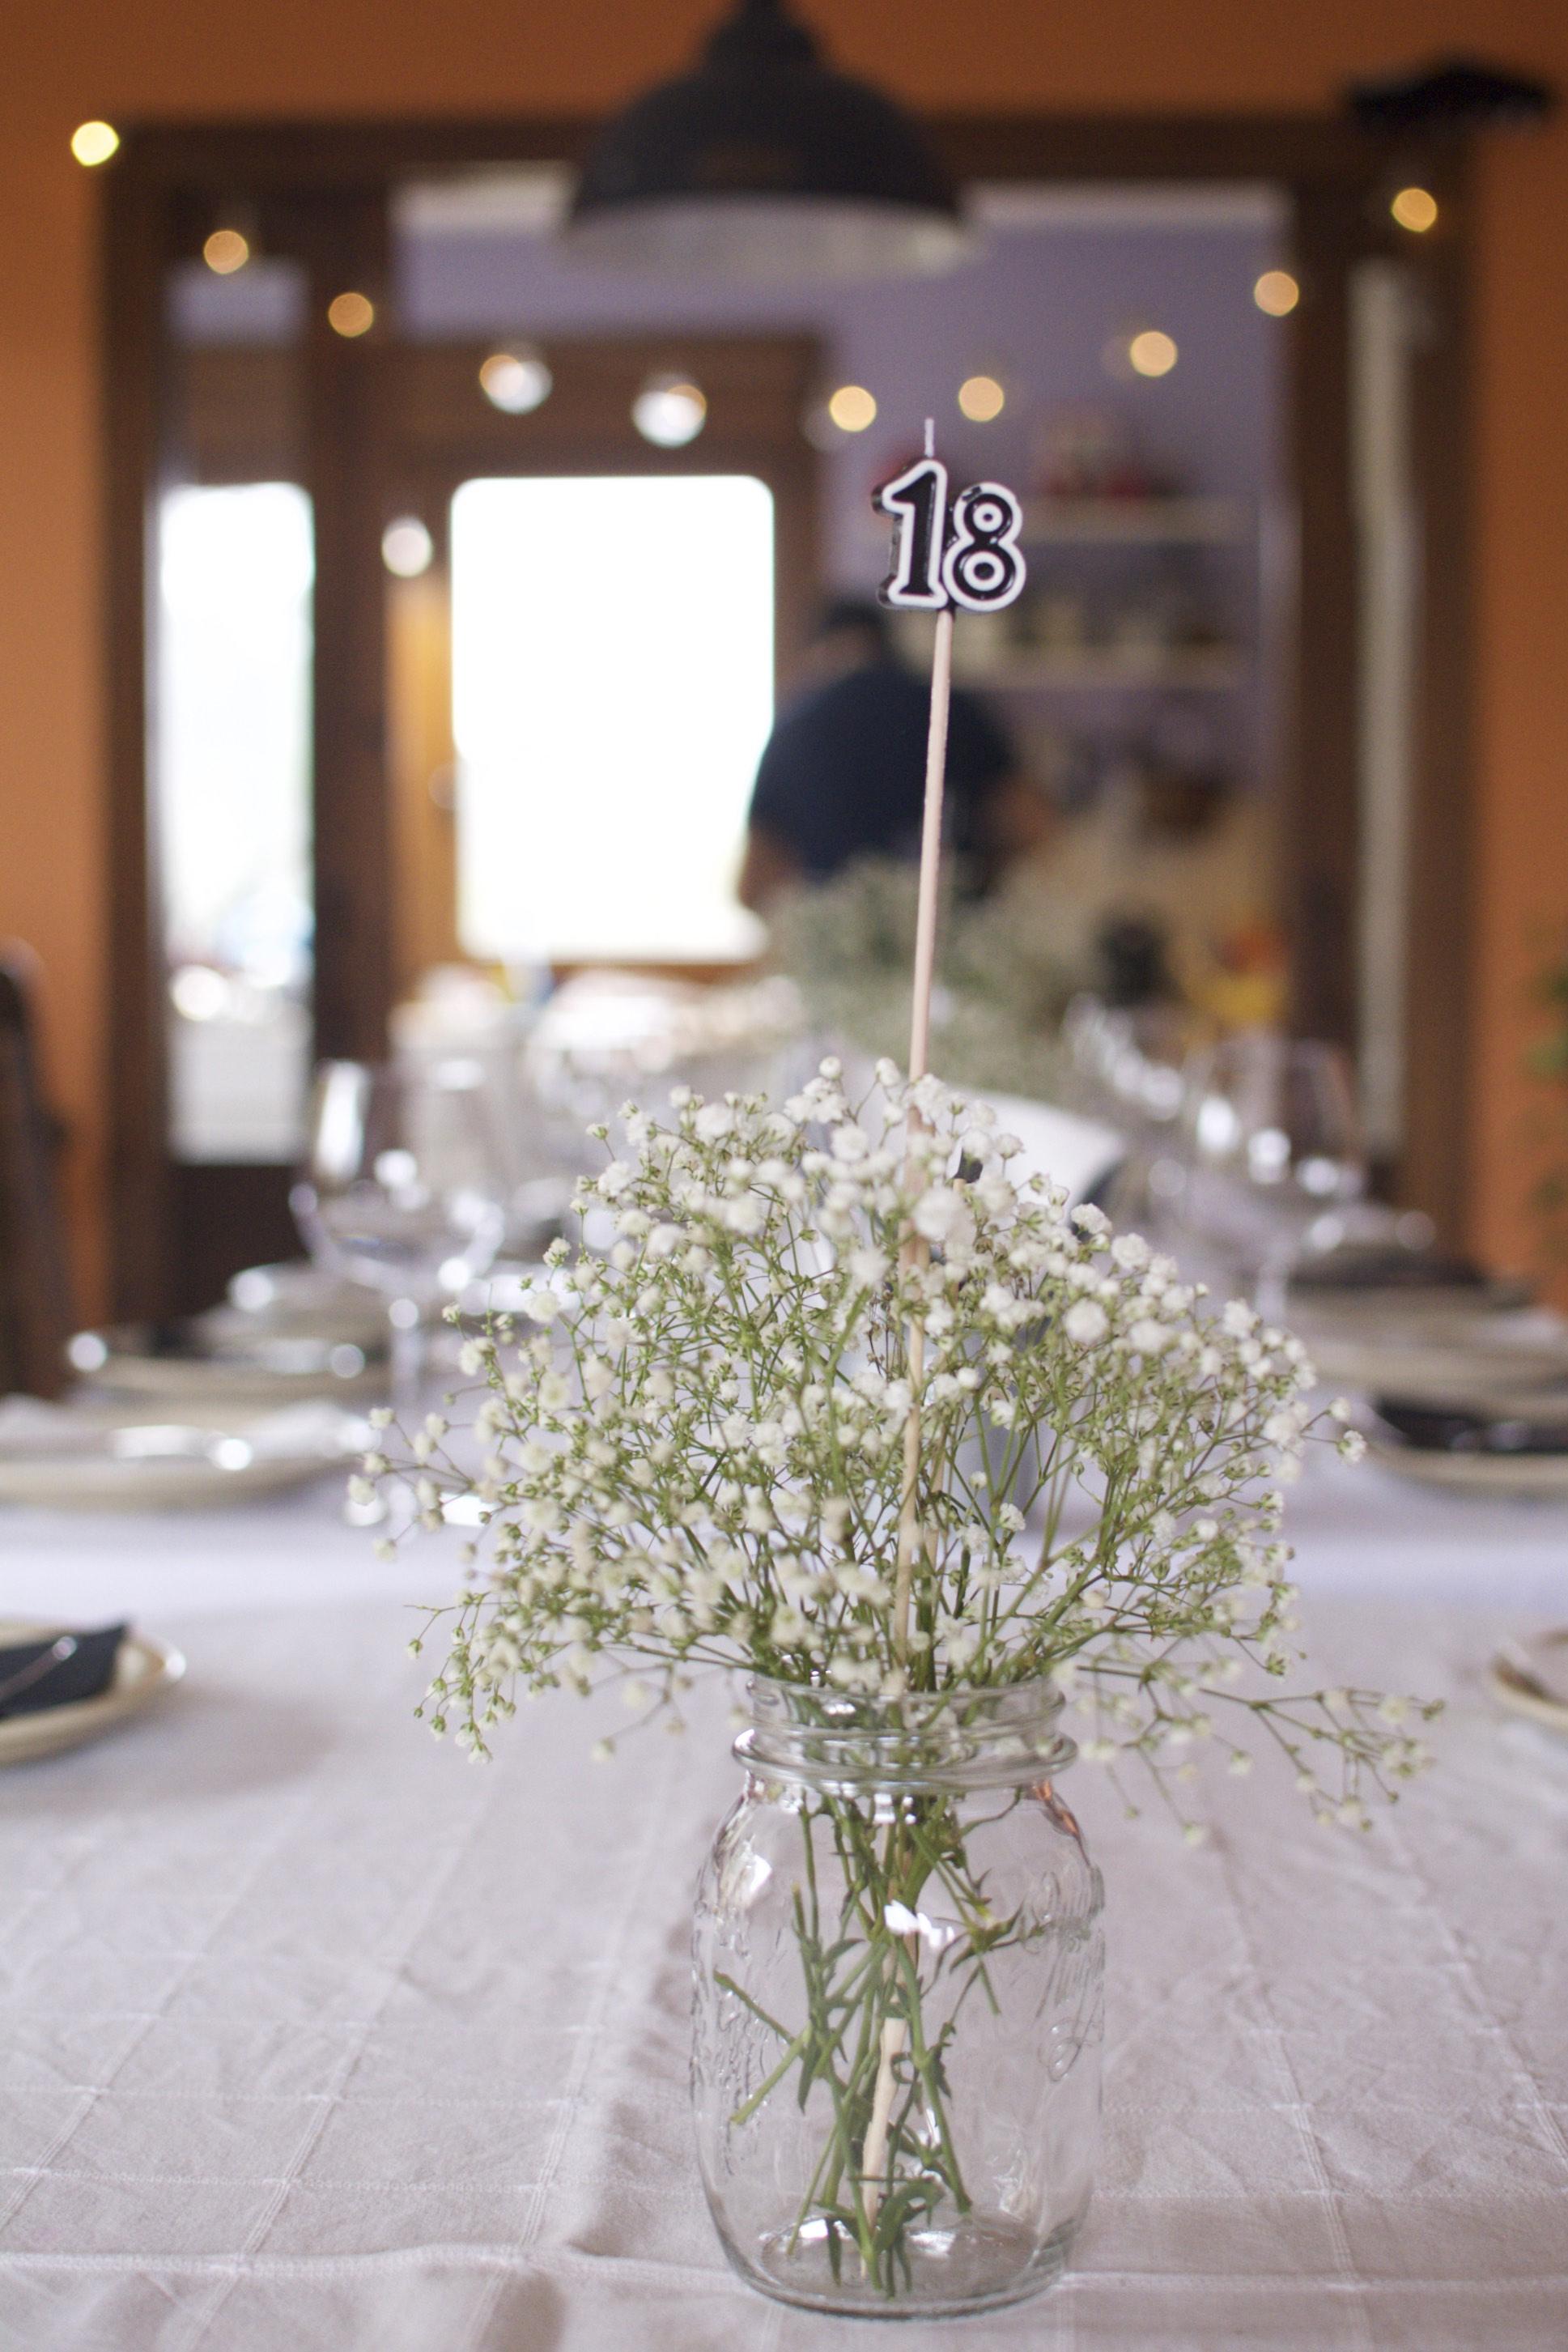 Fiesta 18 cumpleaños